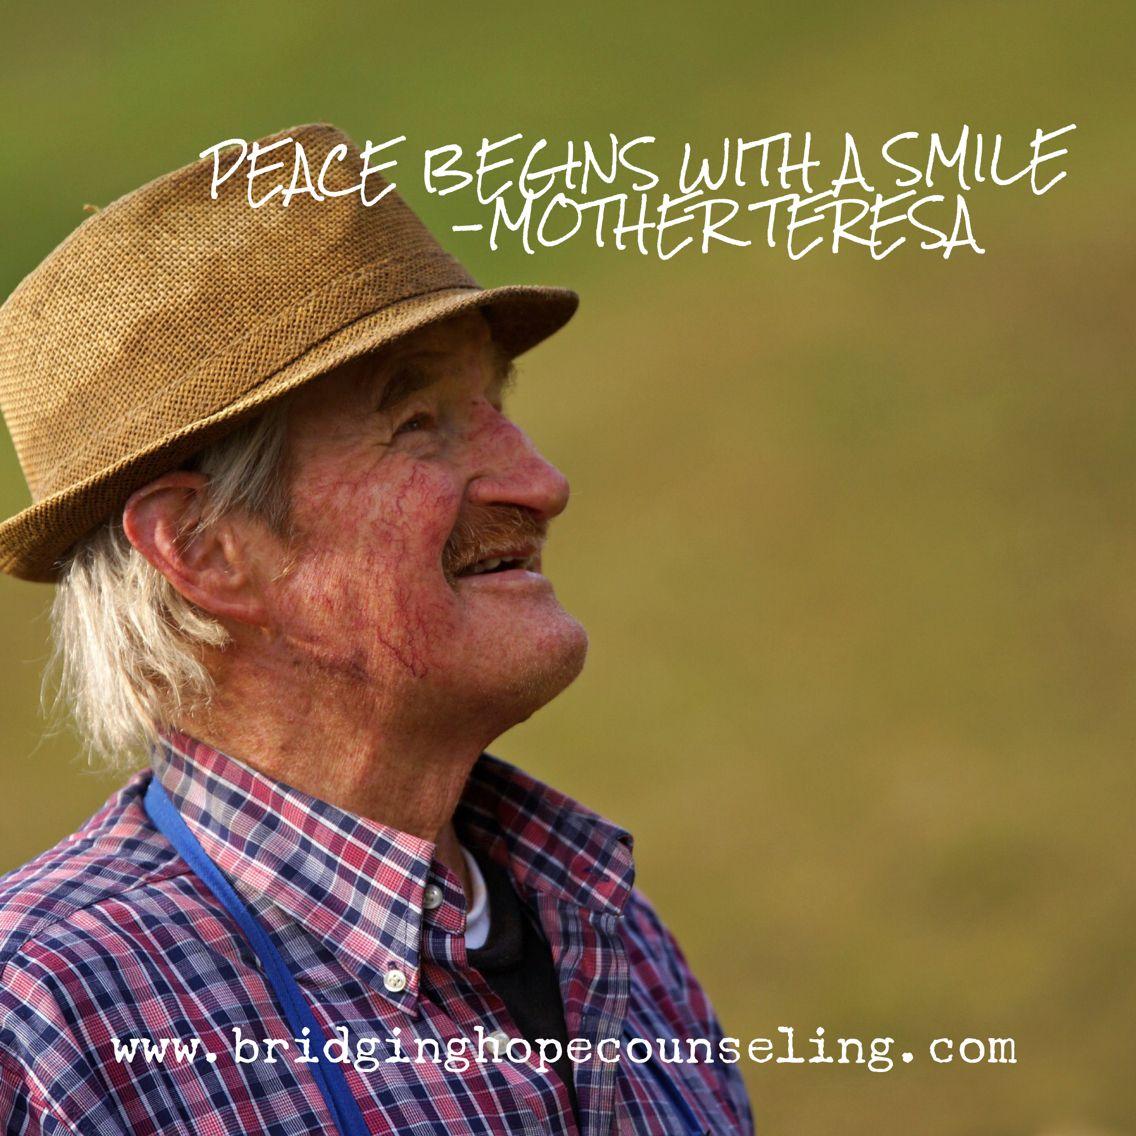 Peace begins with a smile #peace #mentalhealth #motherteresa